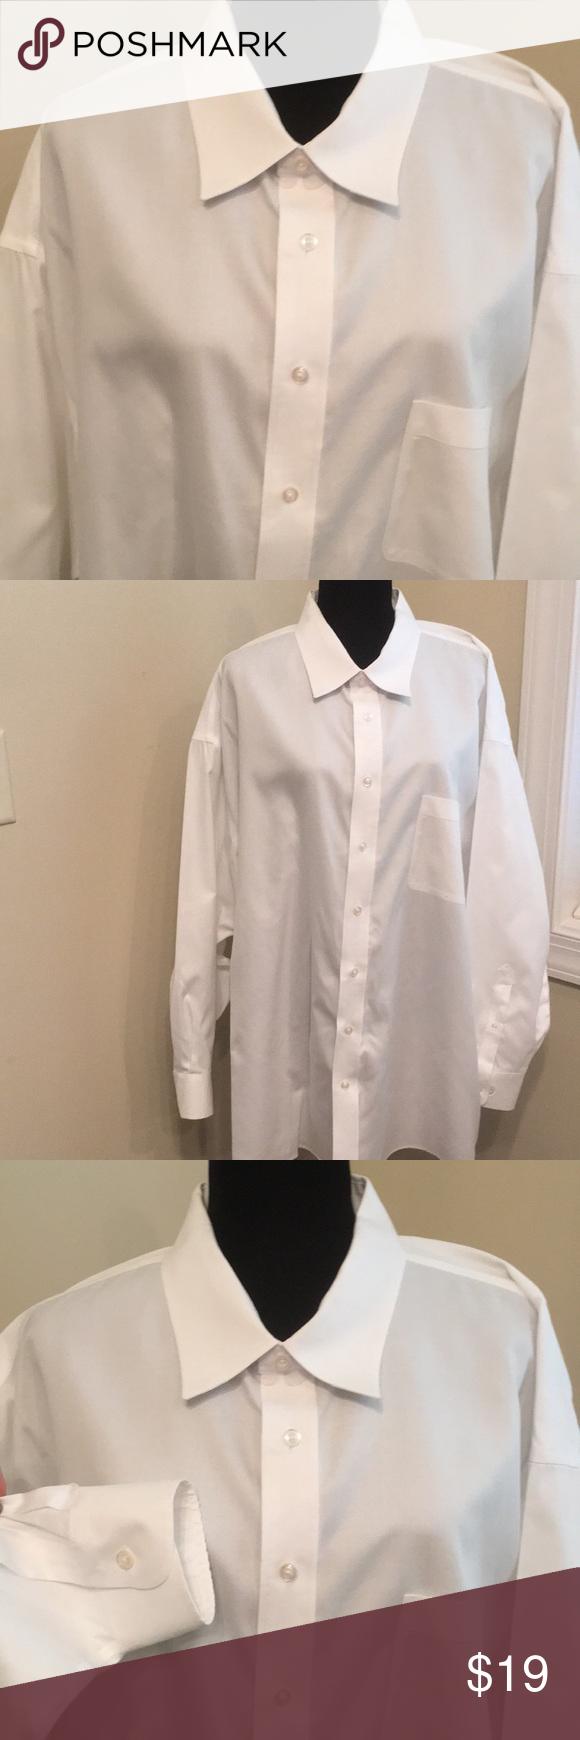 White Dress Shirt 100 Cotton 20 3435 In 2018 My Posh Picks